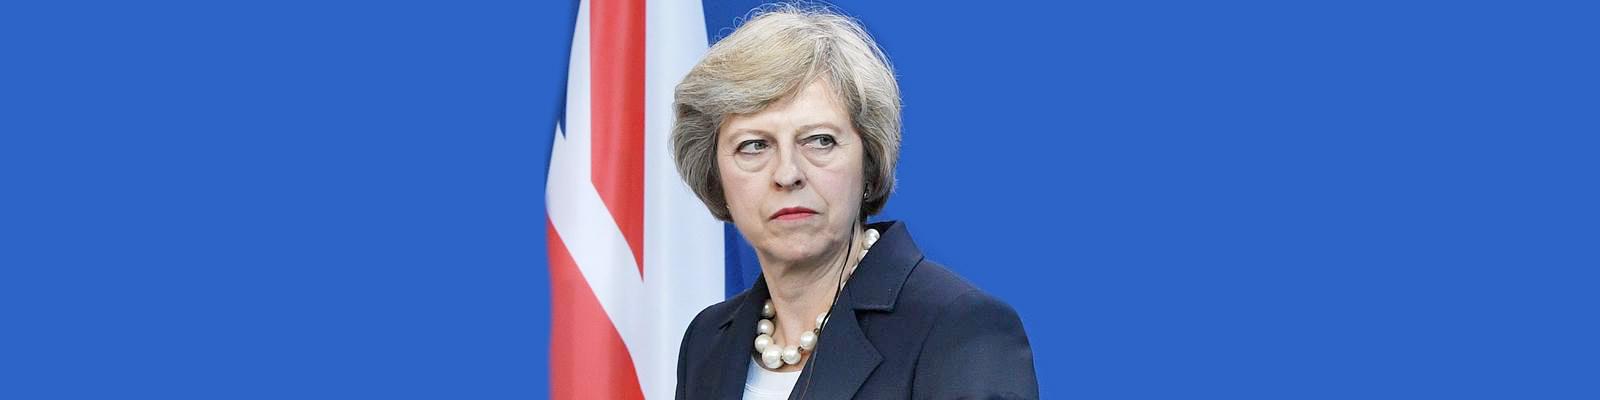 PM's Brexit Plan